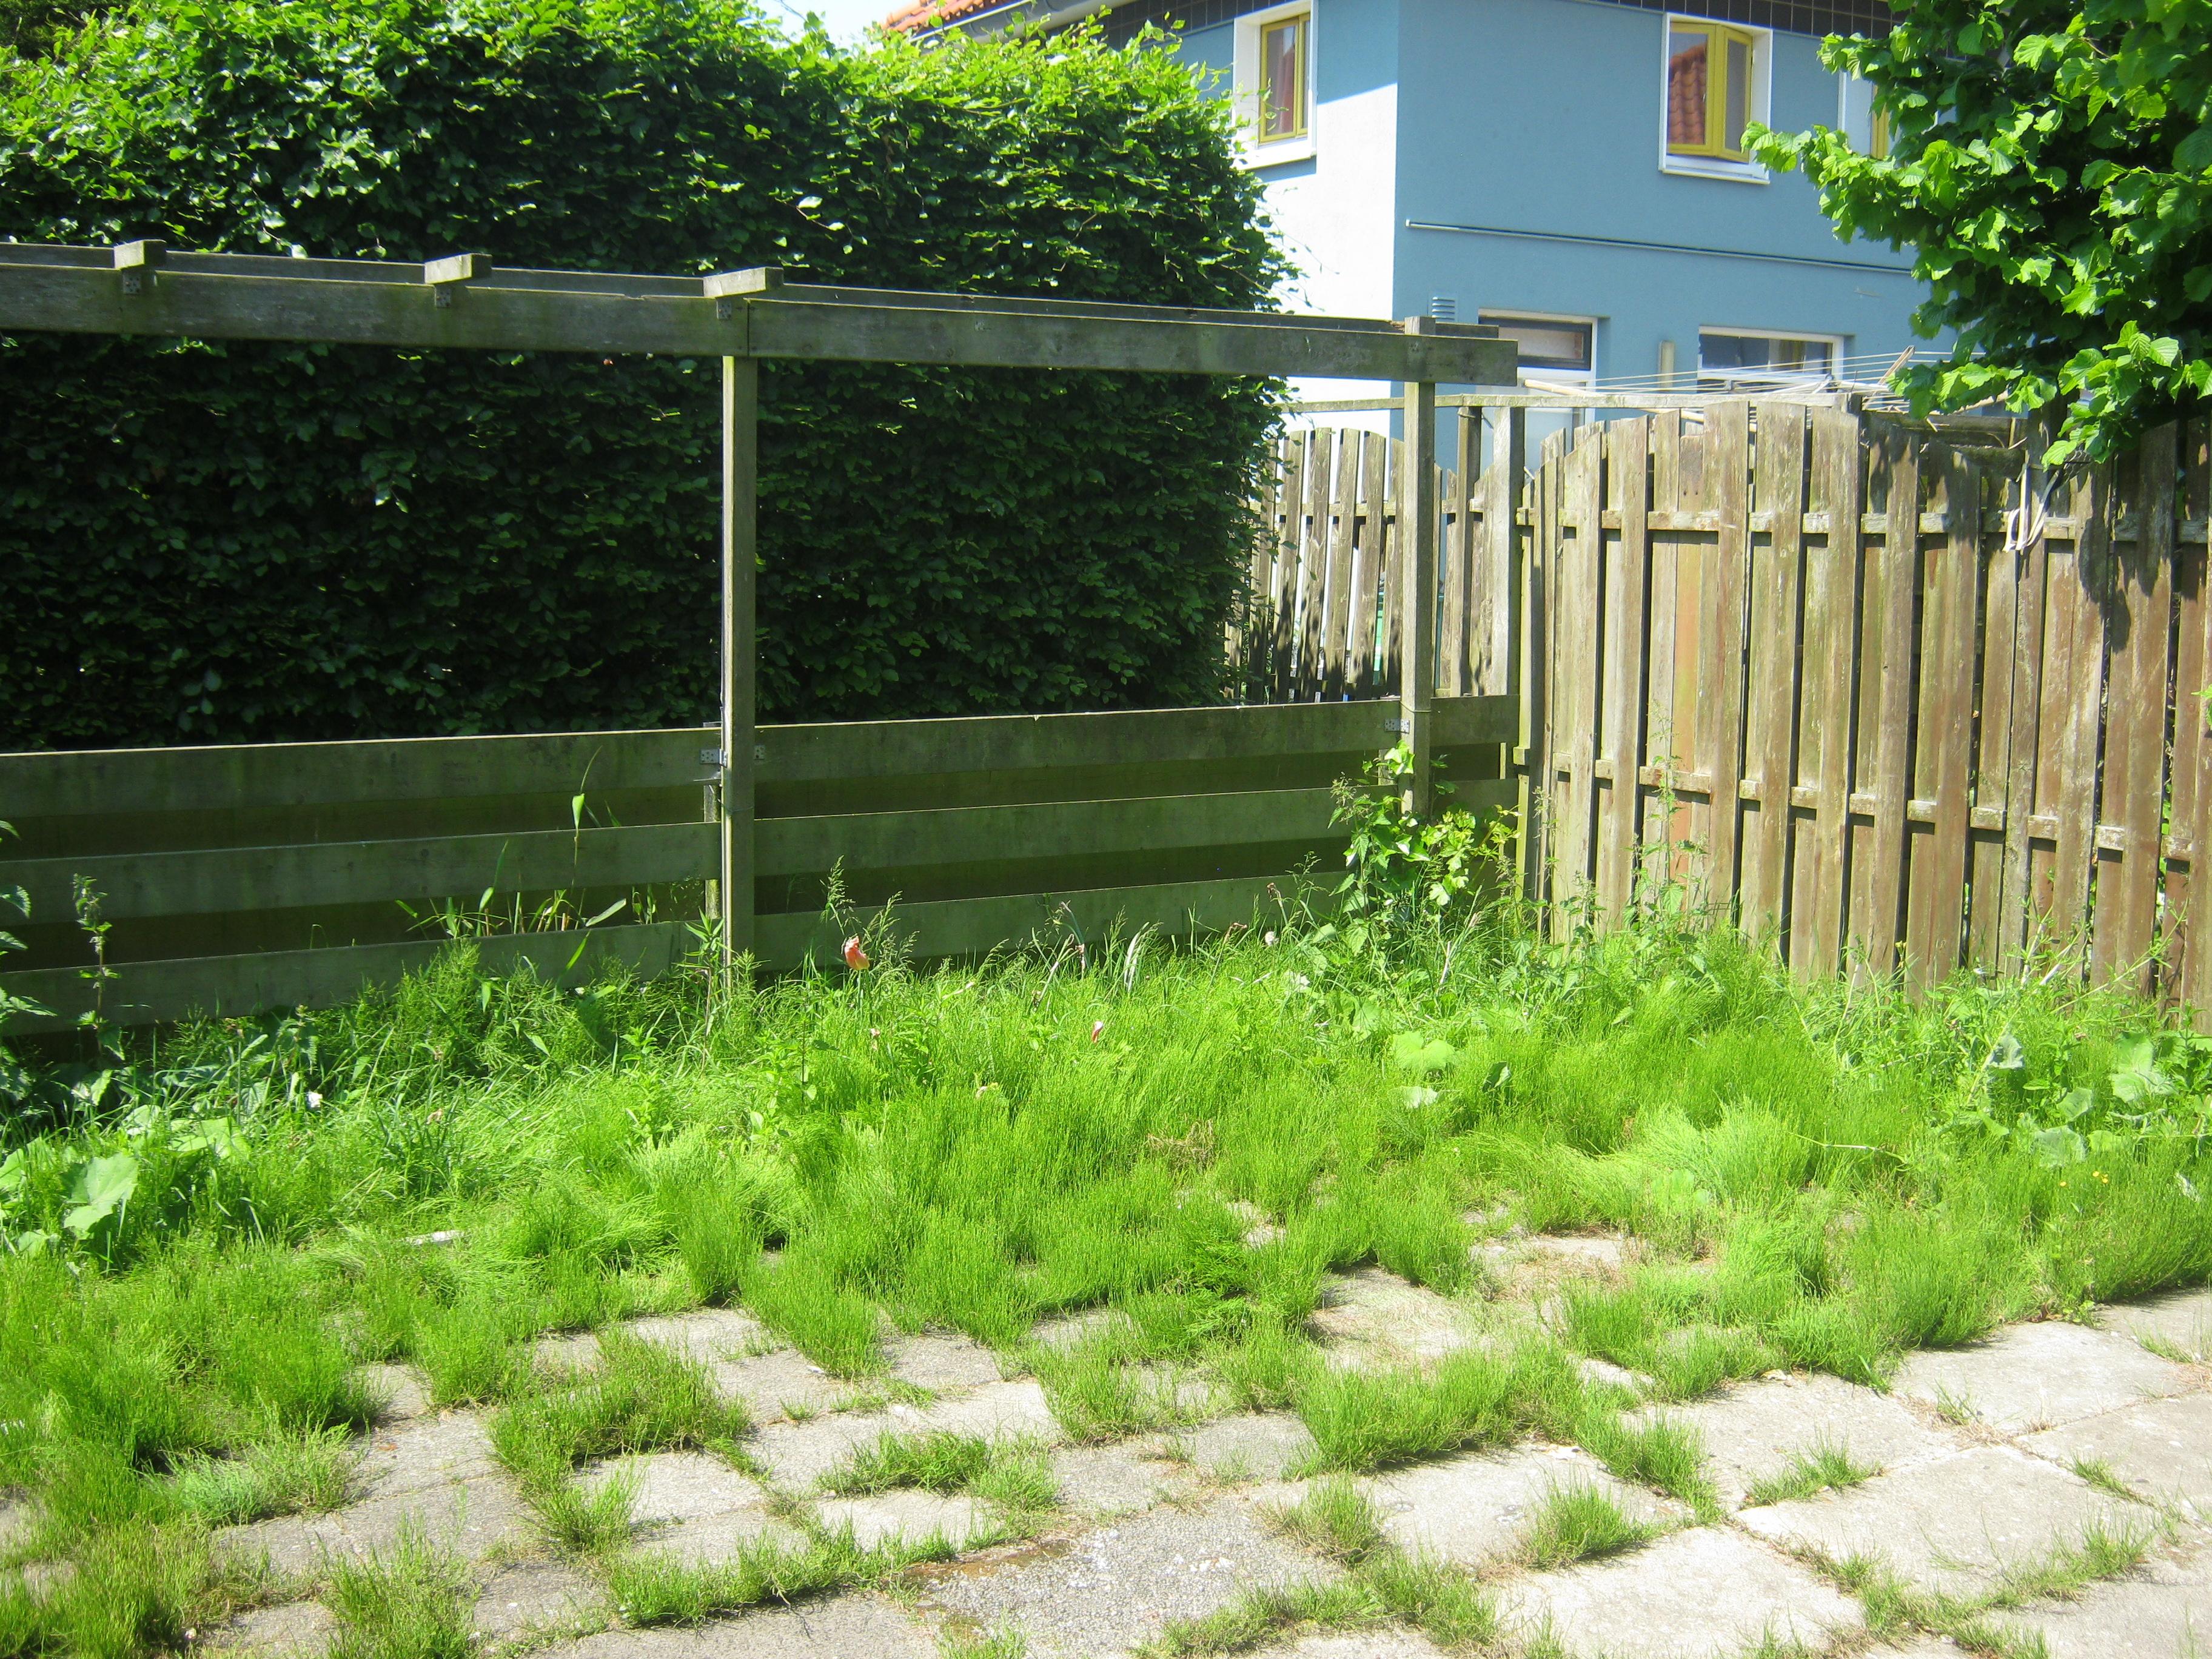 Sociaal tuinieren makeover tuinen bloemenbuurt nederlandse tuinenstichting nts - Tuin van de tuin ...